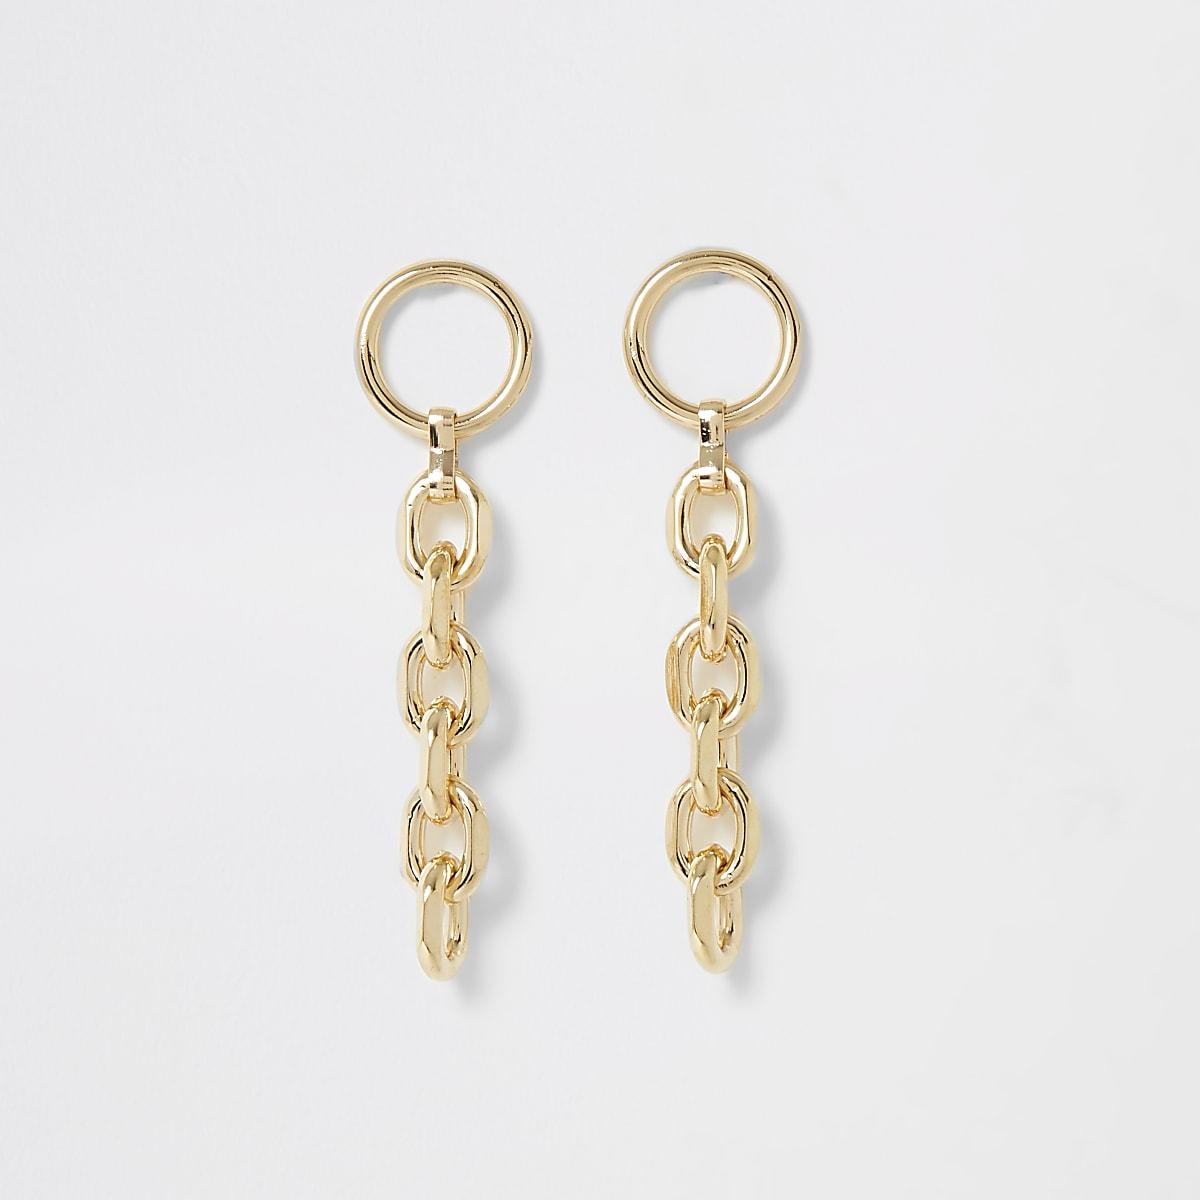 Gold colour chain drop earrings